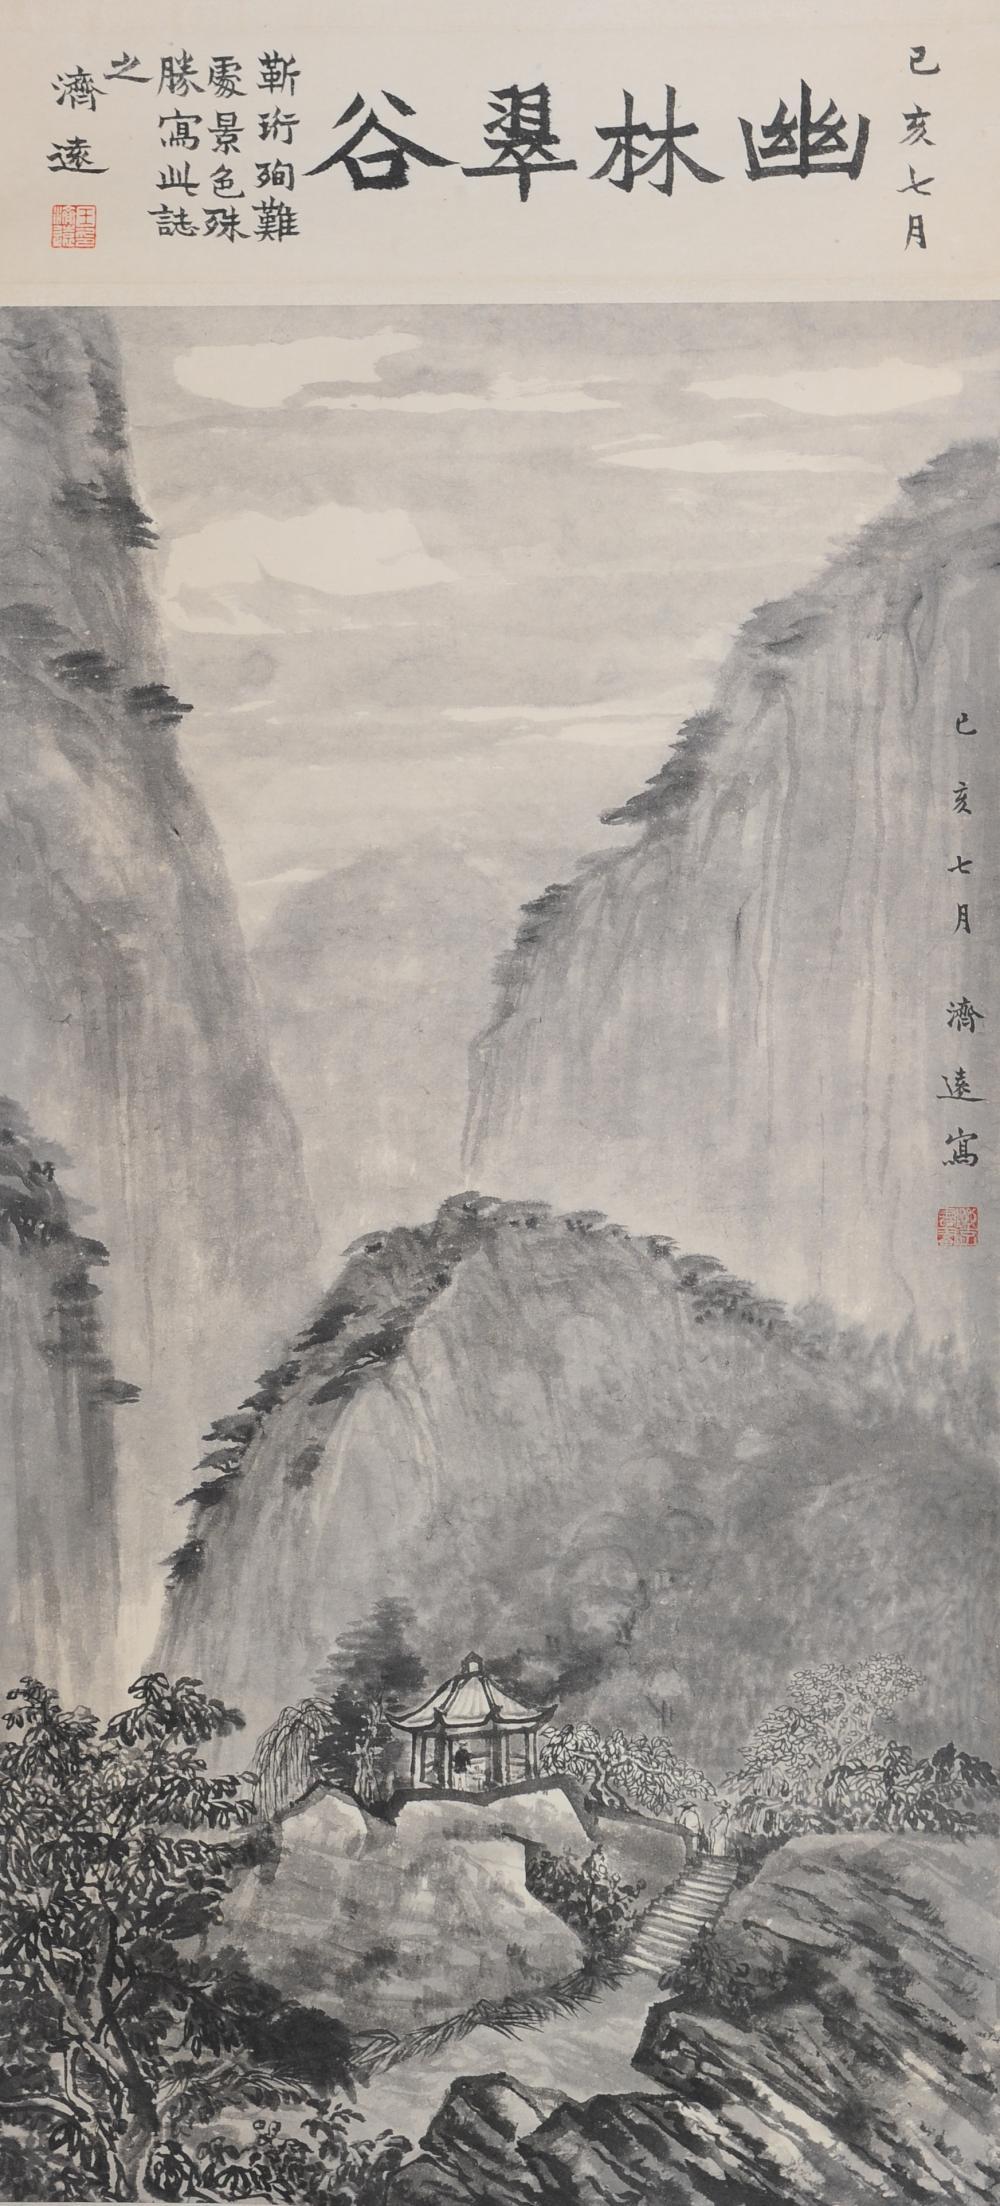 CHINESE LANDSCAPE PAINTING BY WANG JIYUAN